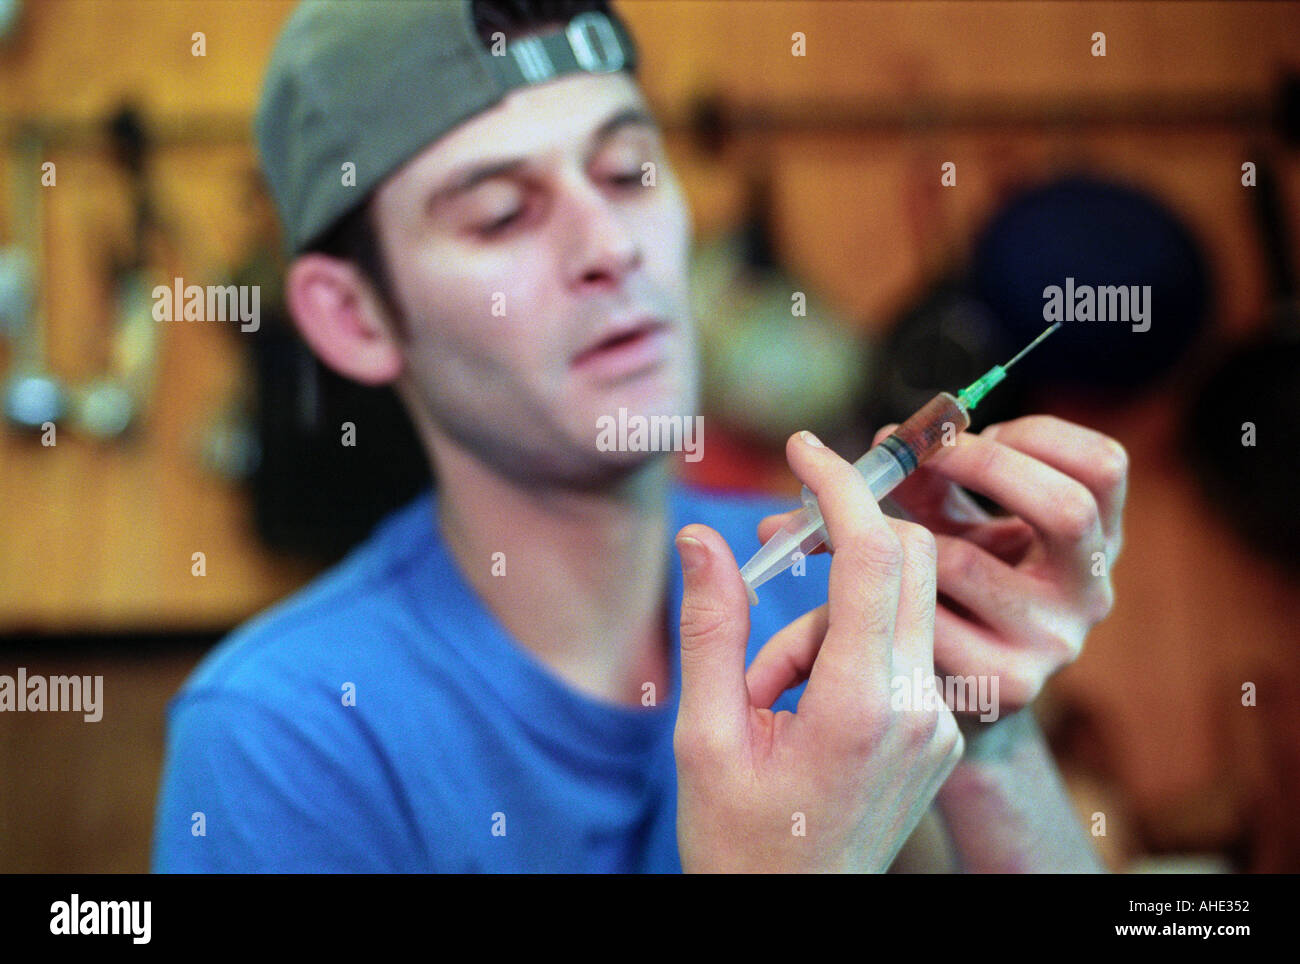 Heroin addict preparing to inject heroin. - Stock Image